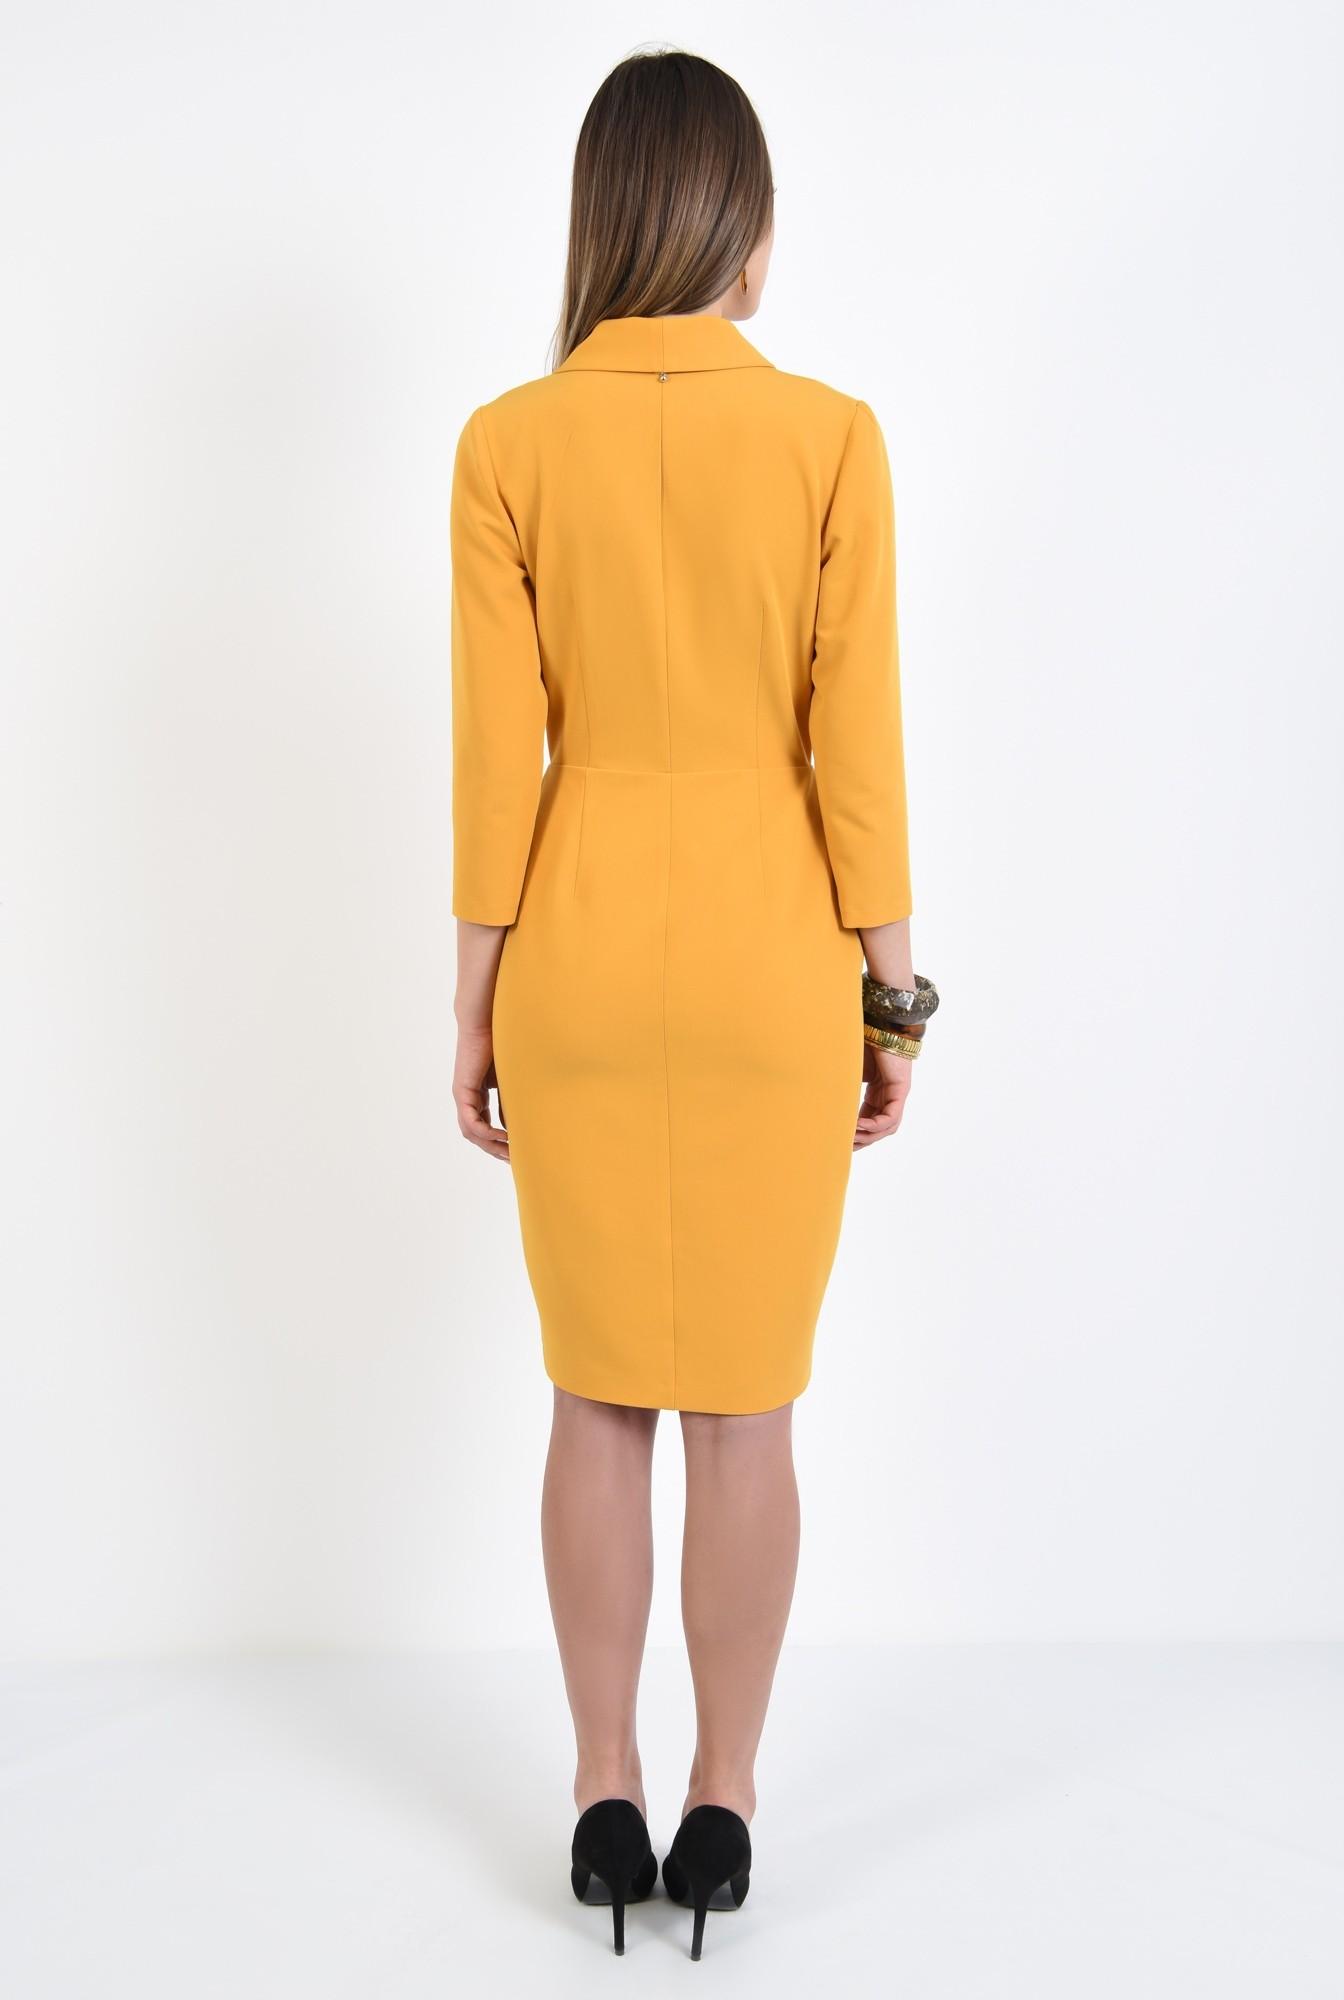 1 - 360 - rochie eleganta, conica, midi, galbena, mustar, rochie office